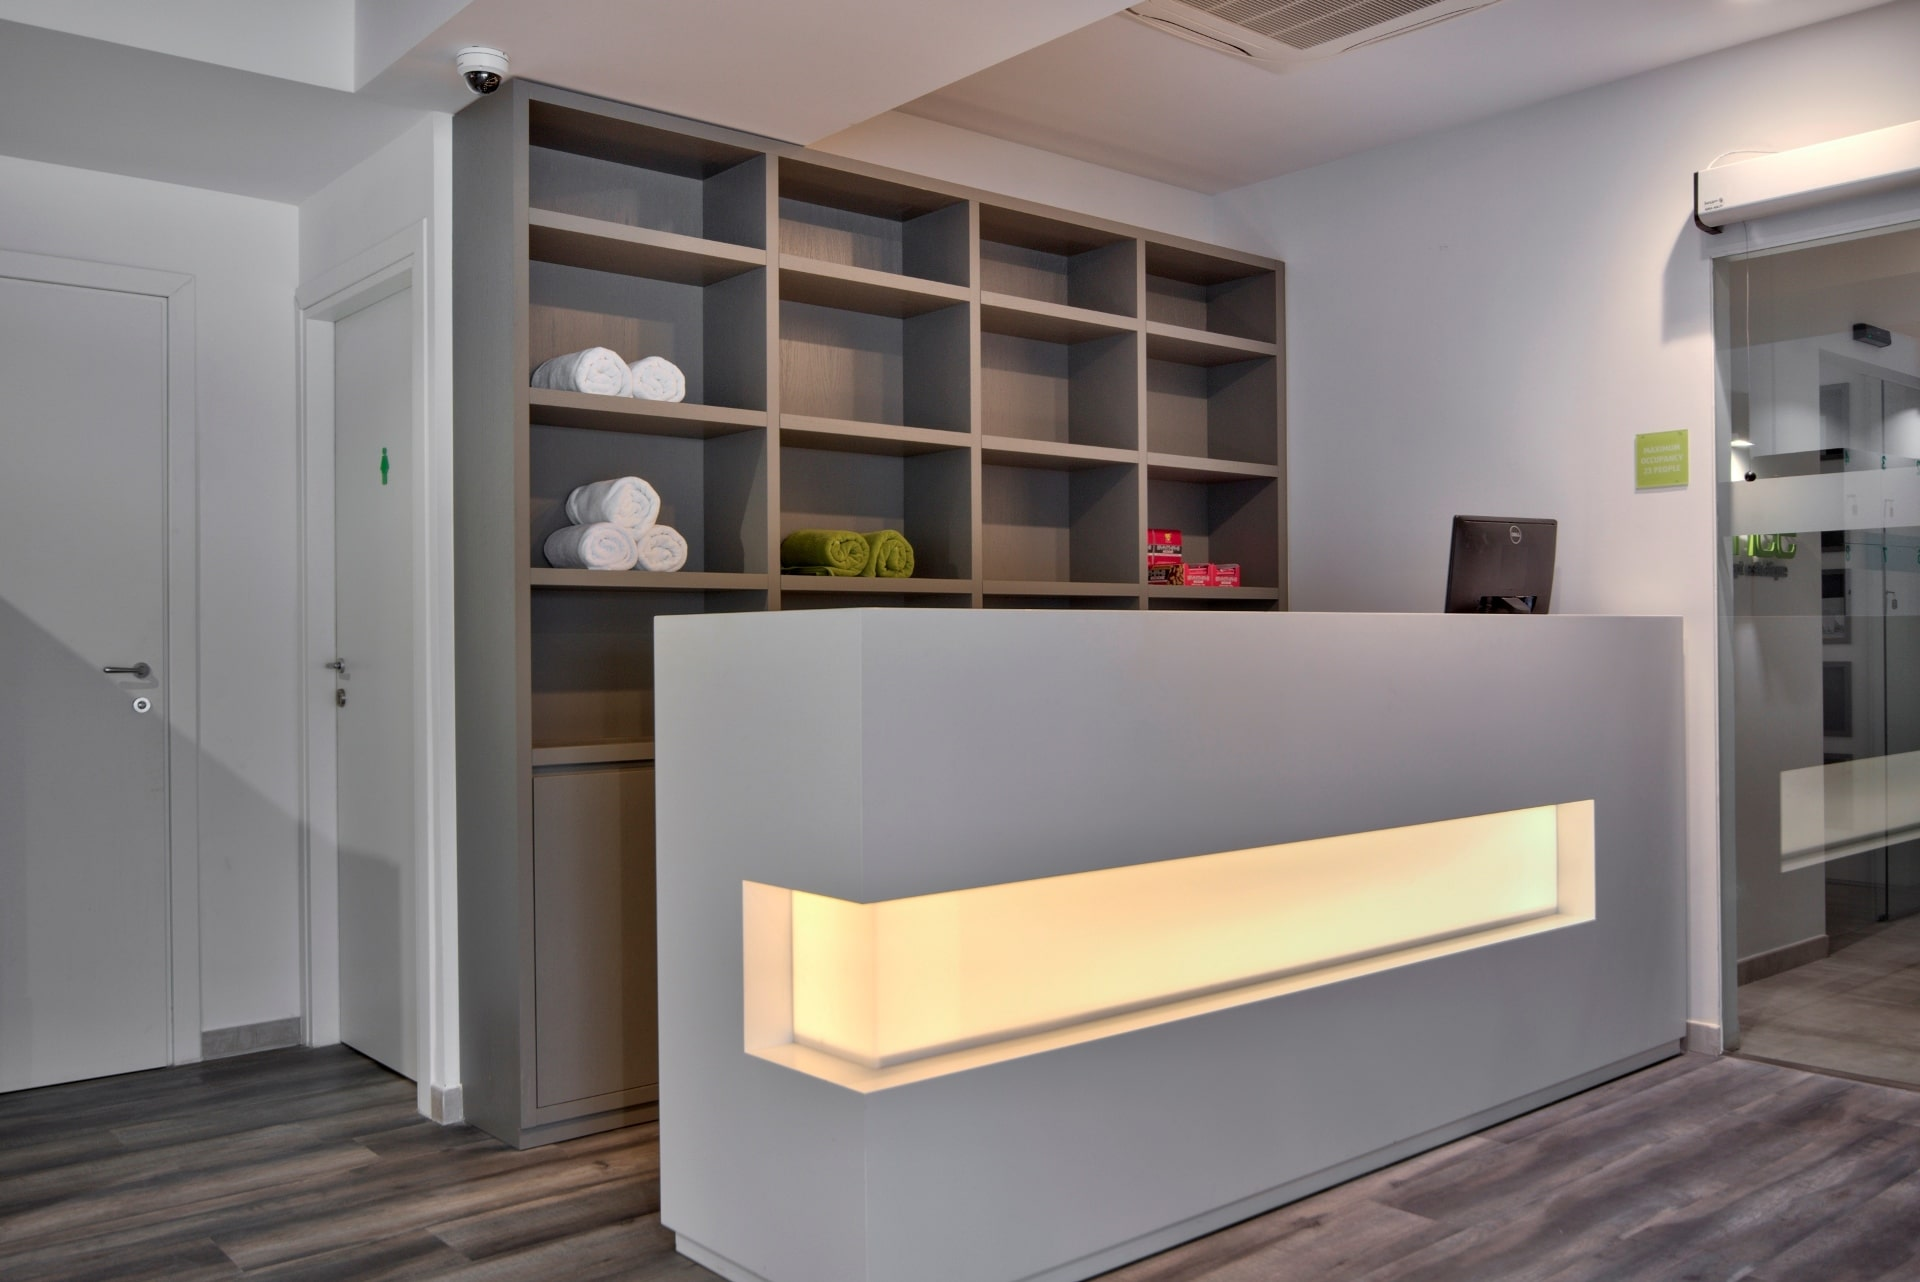 Gym – reception desk, storage, lighting